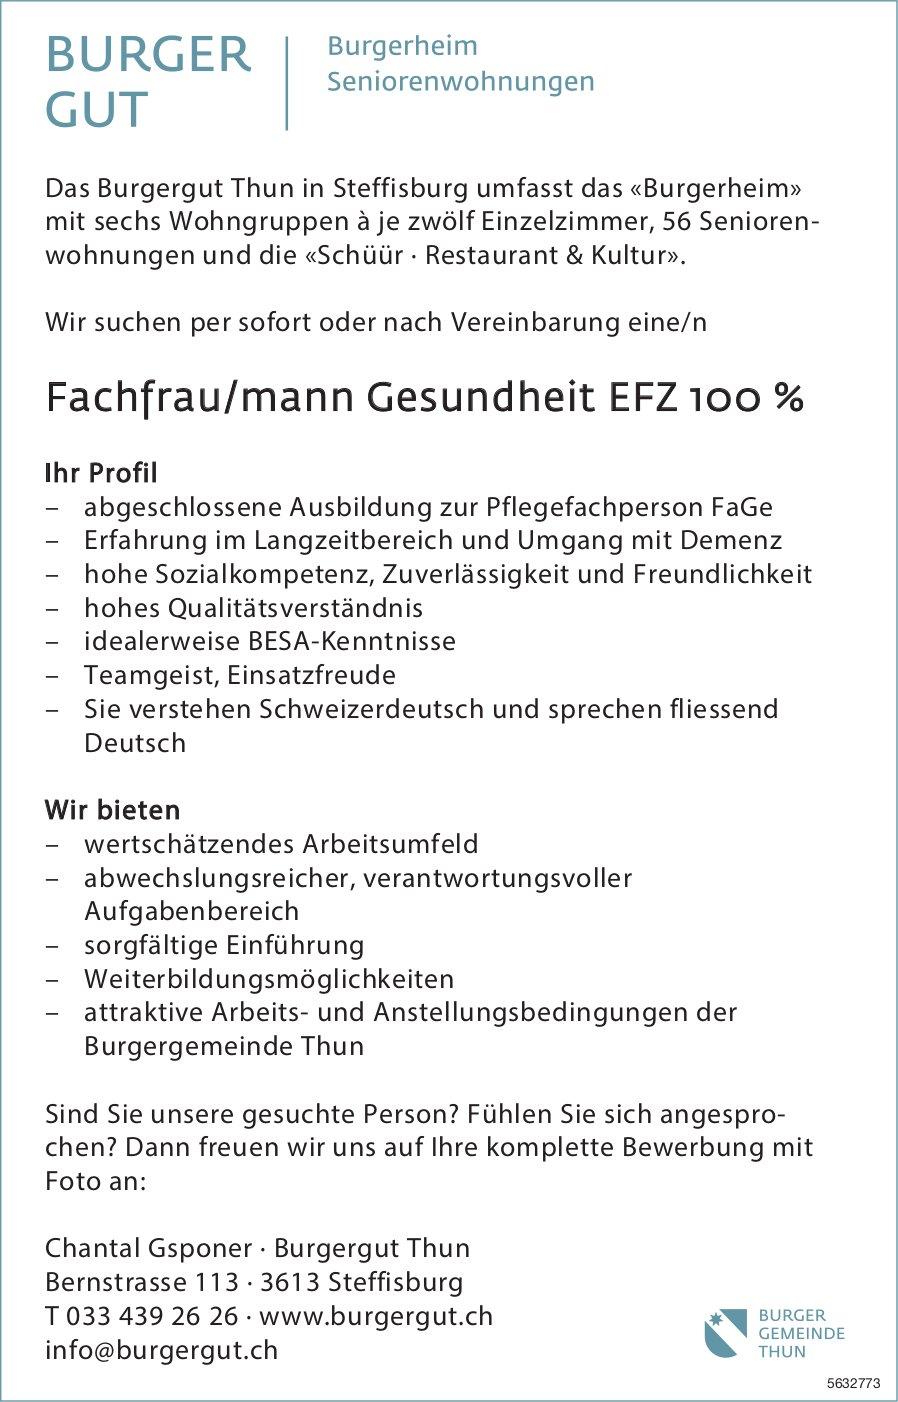 Fachfrau/mann Gesundheit EFZ 100 %, Burgergut Thun, Steffisburg, gesucht